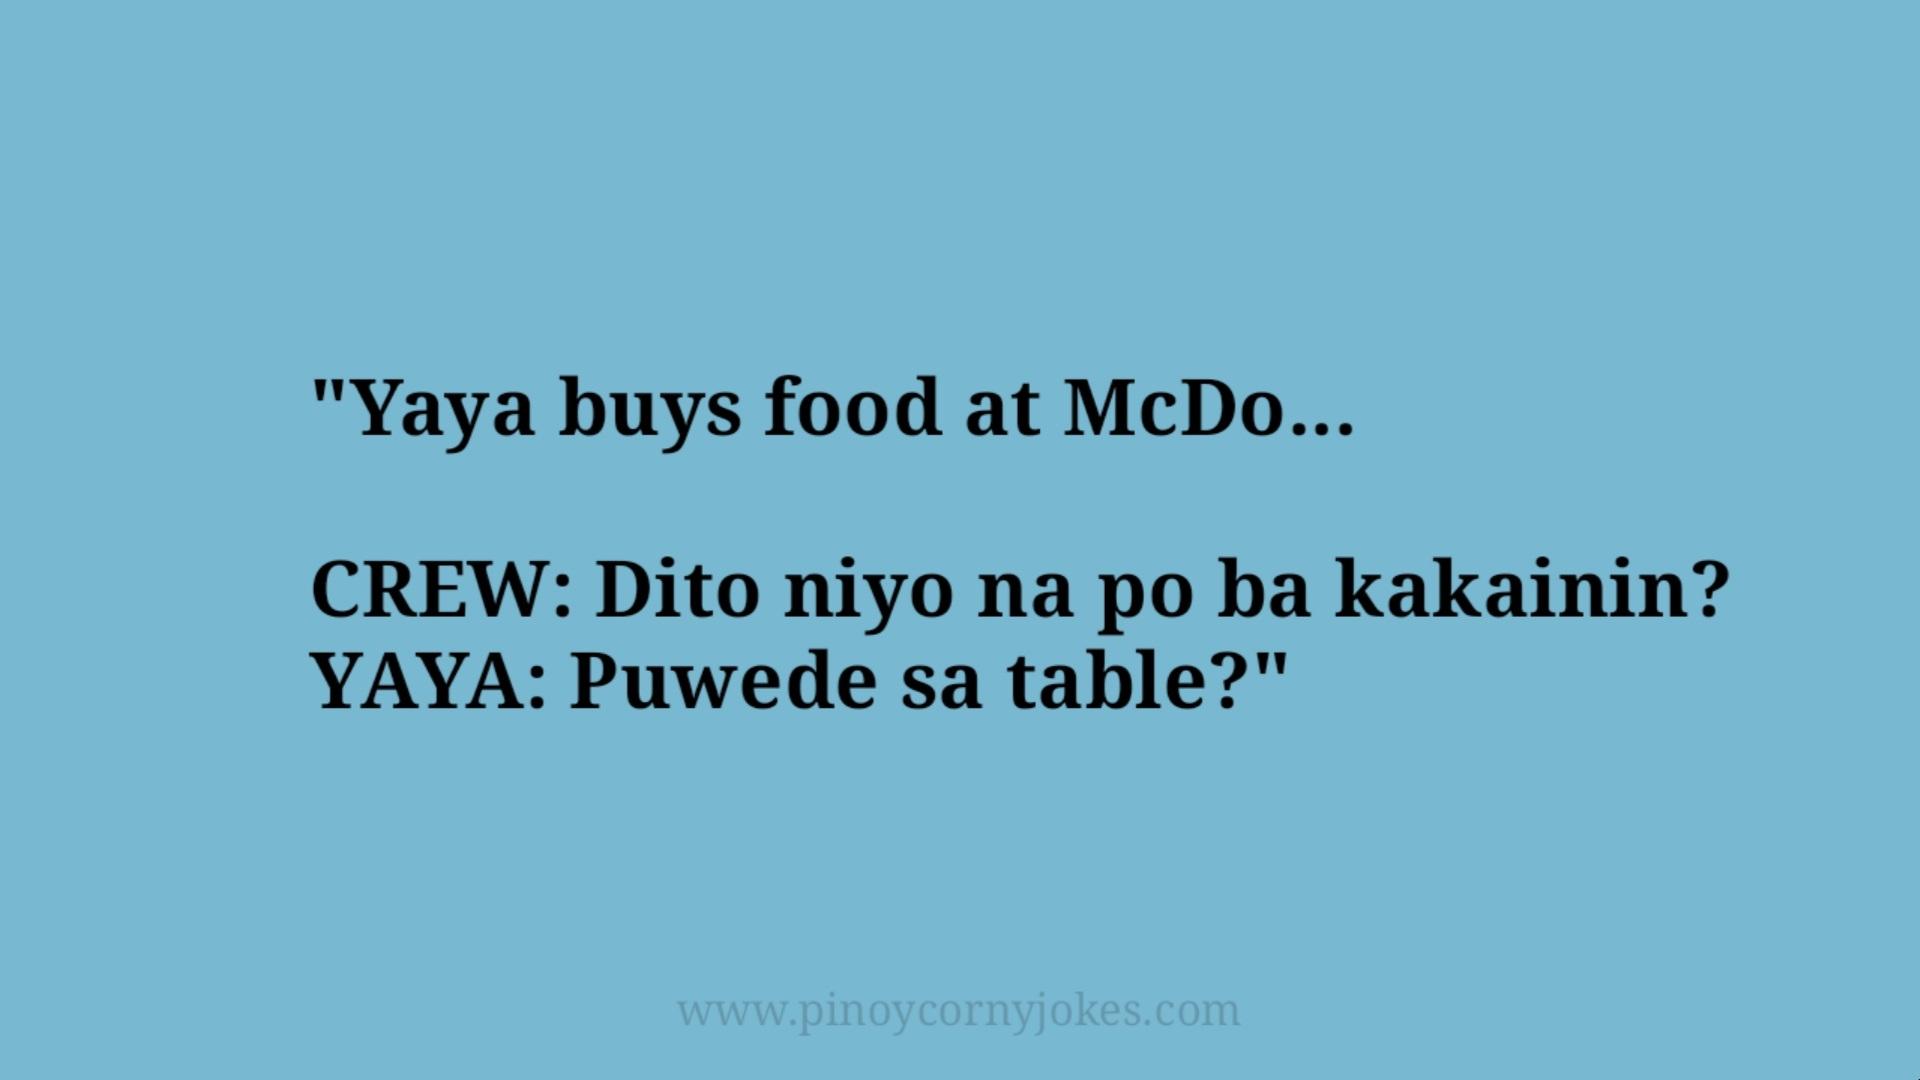 mcdo best inday pinoy jokes 2021